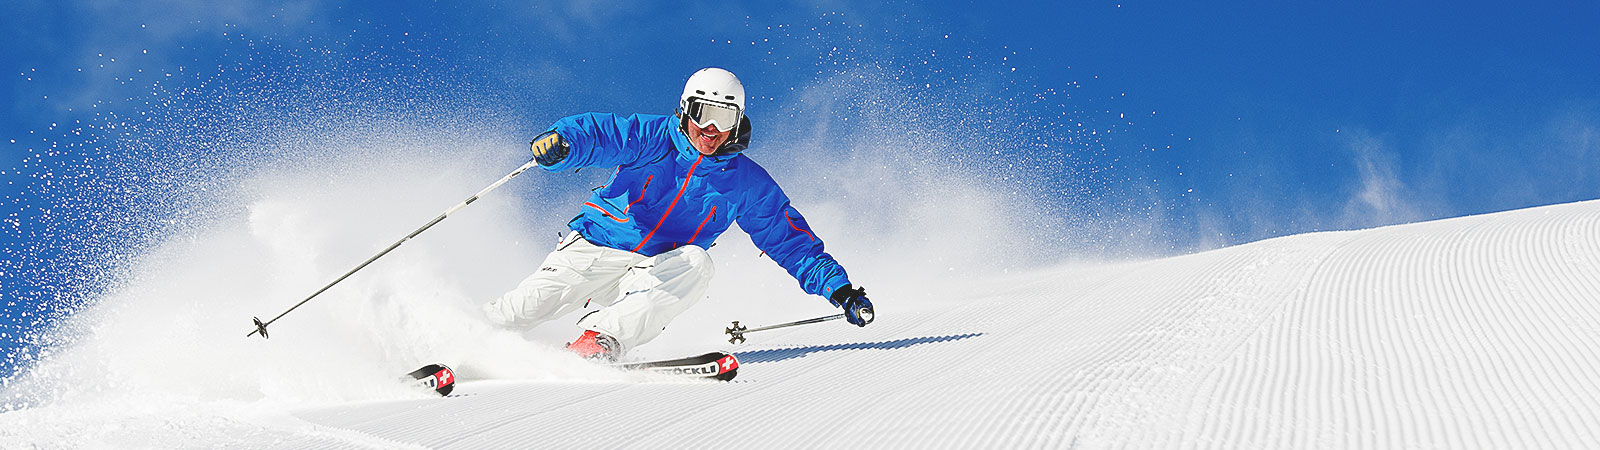 Discount ski rentals Whistler